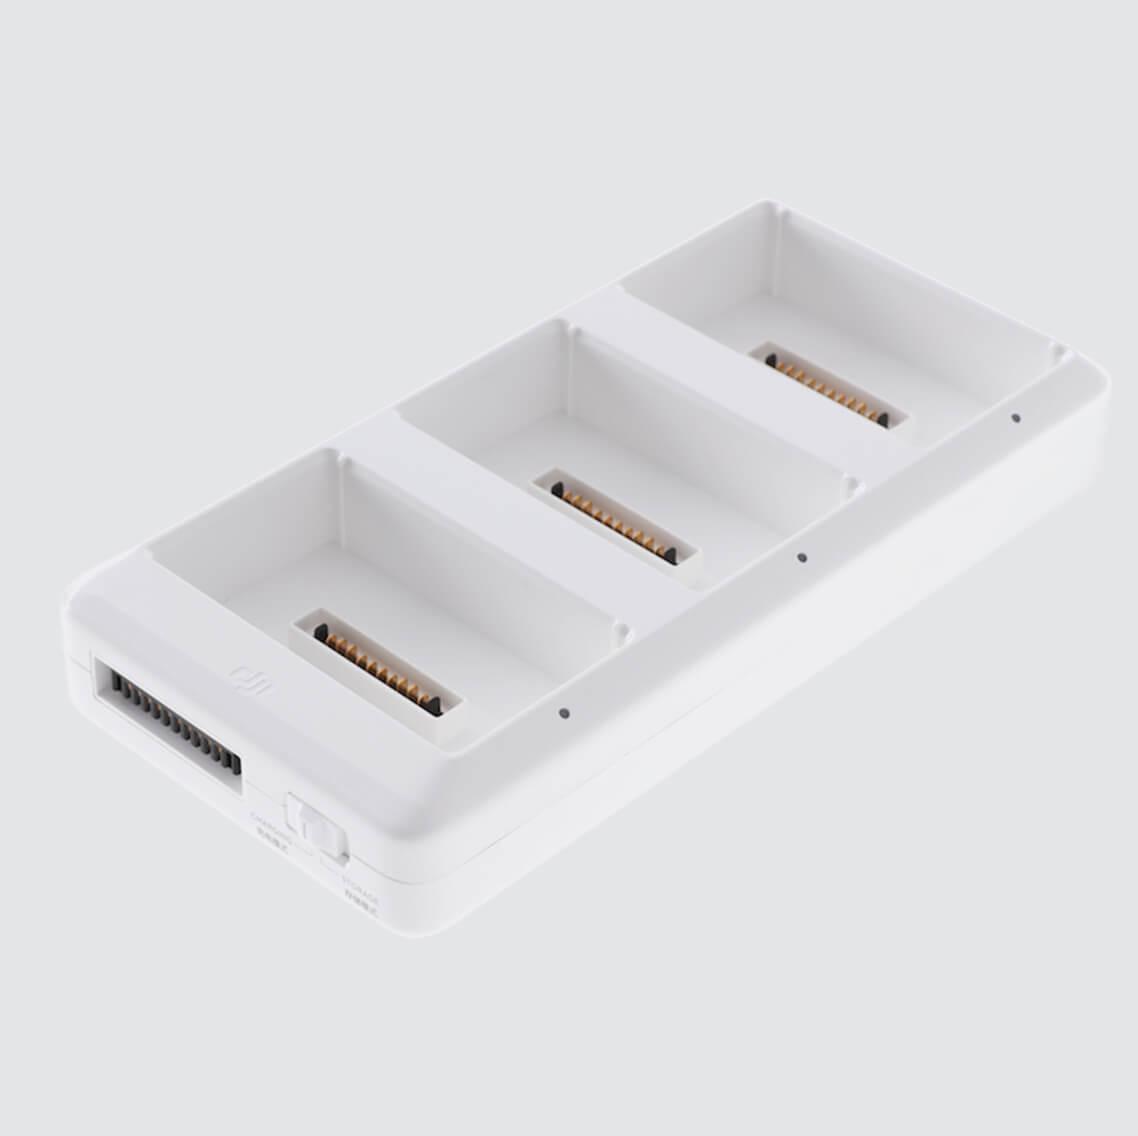 Phantom 4 Series - Battery Charging Hub